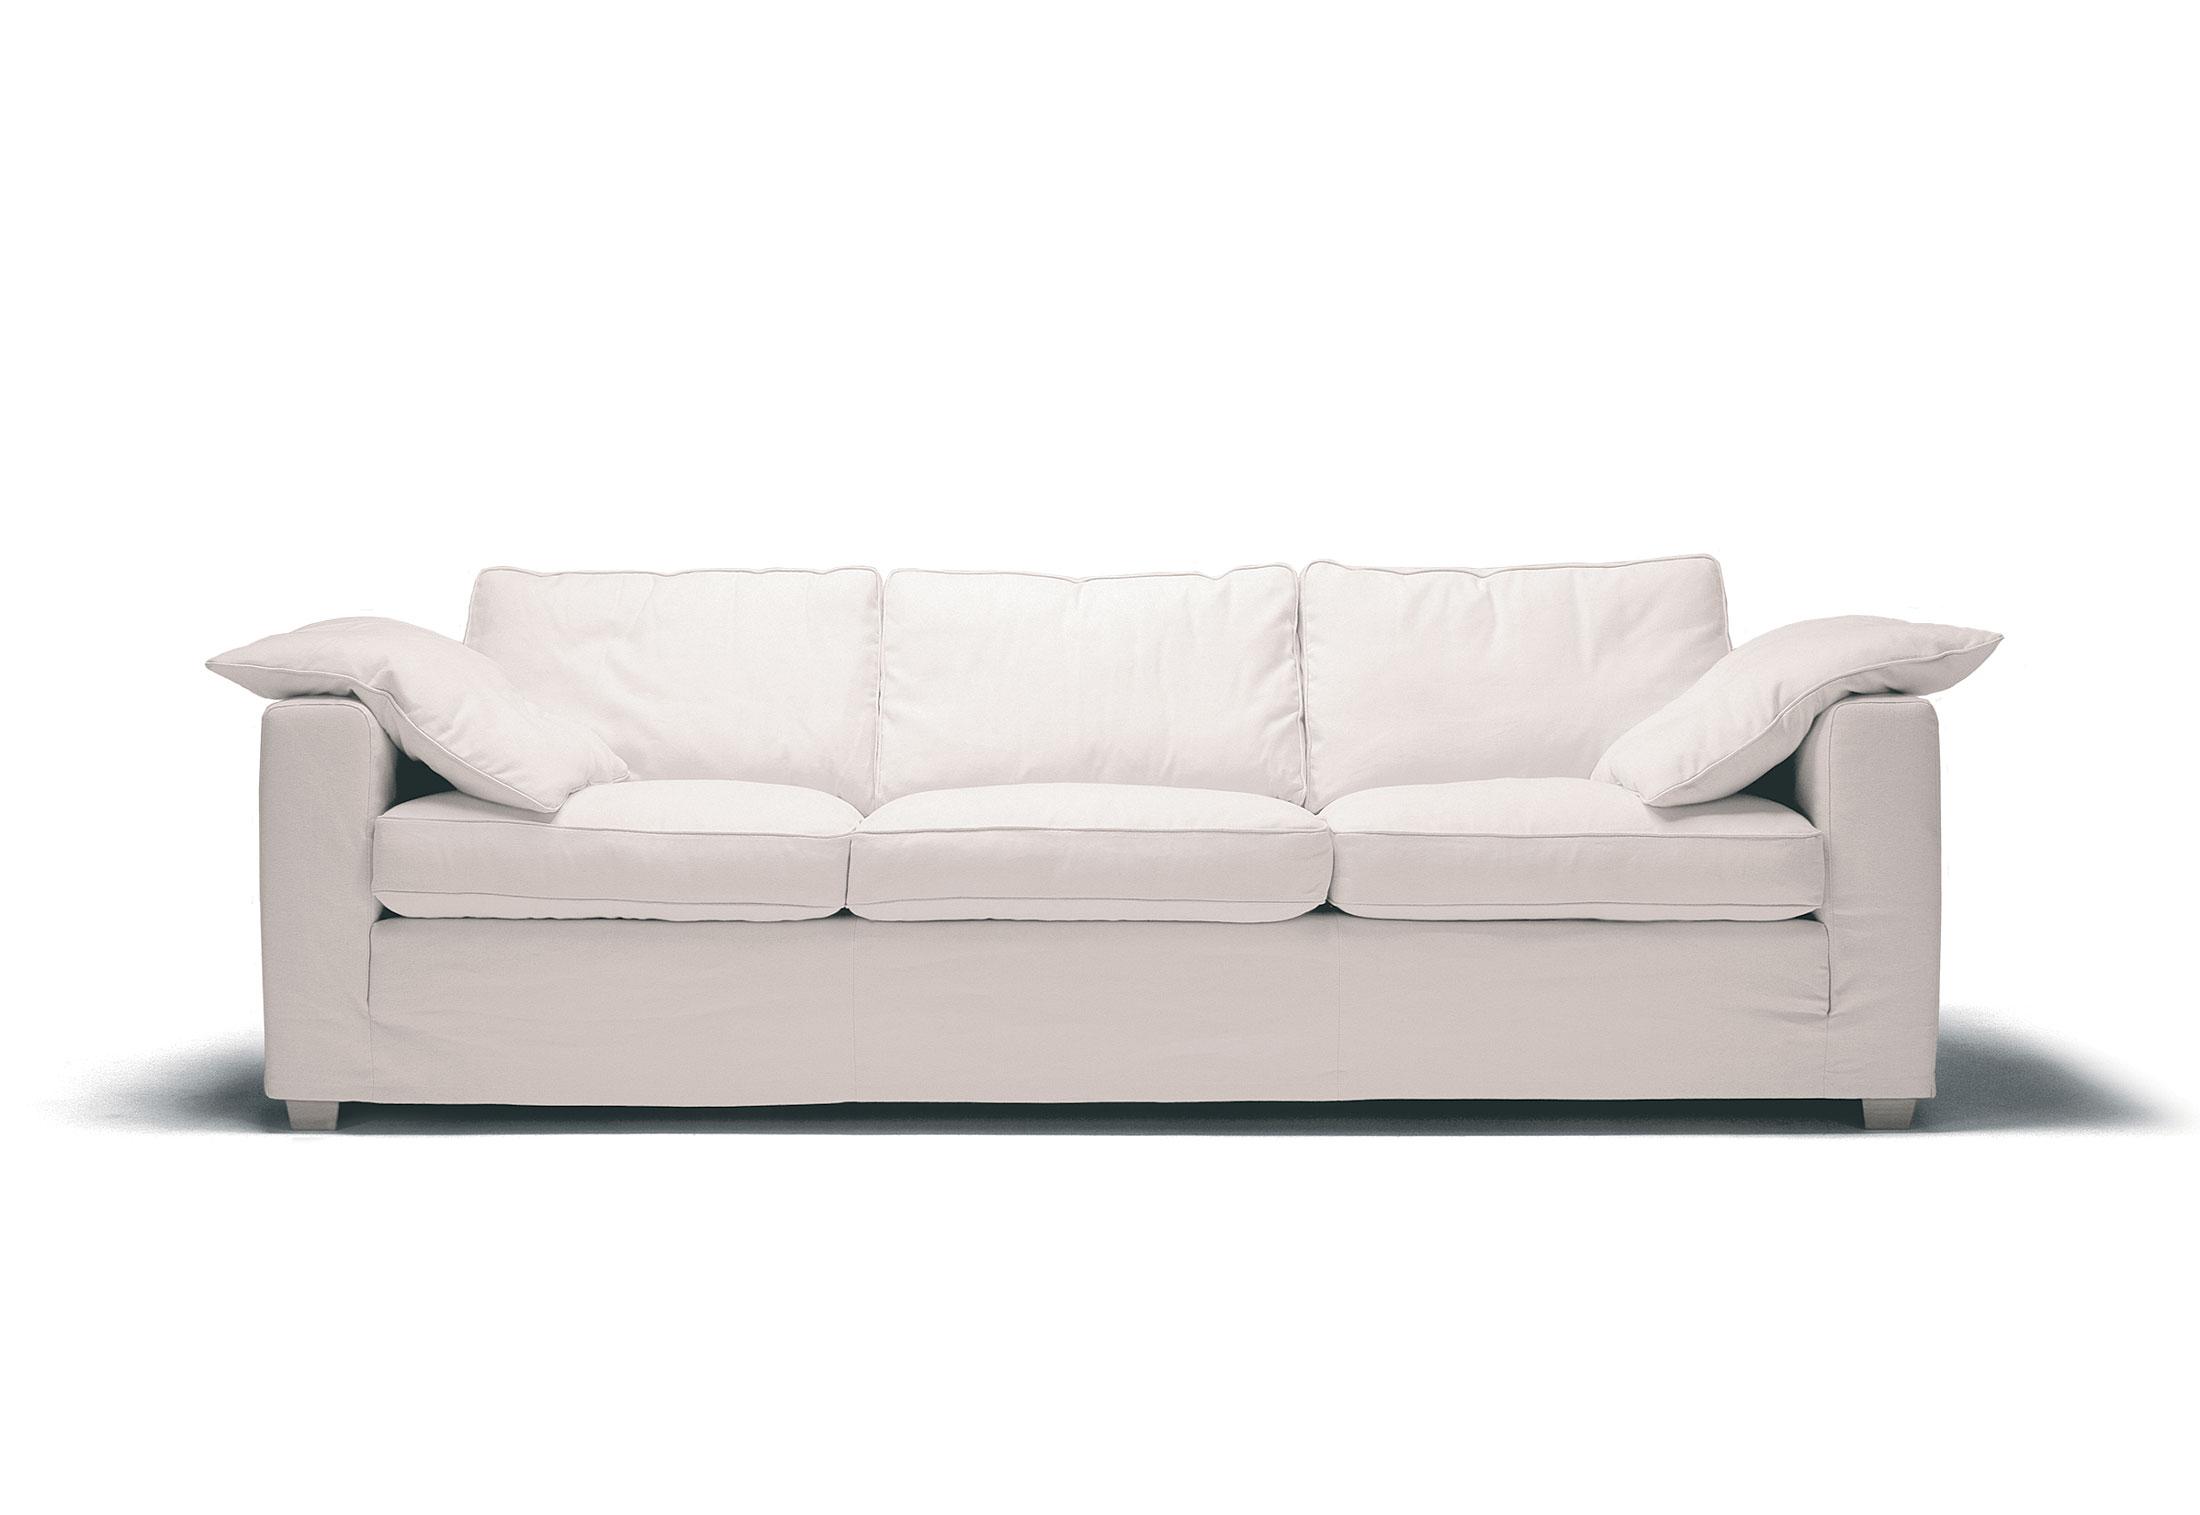 ez hang chairs loveseat instructions white fluffy bean bag chair easy living sofas corner furniture thesofa